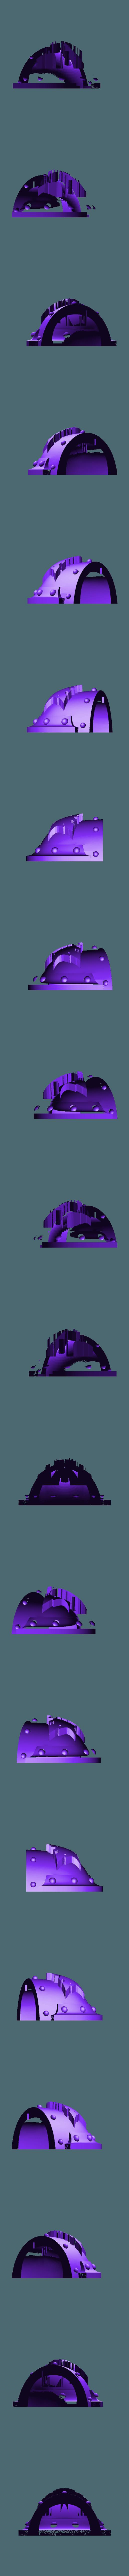 Morkai_Rep_MKV_and_VI_blank_3_Pad.stl Download free STL file Double Wolf head Chapter insignia • 3D printing model, Tatsura